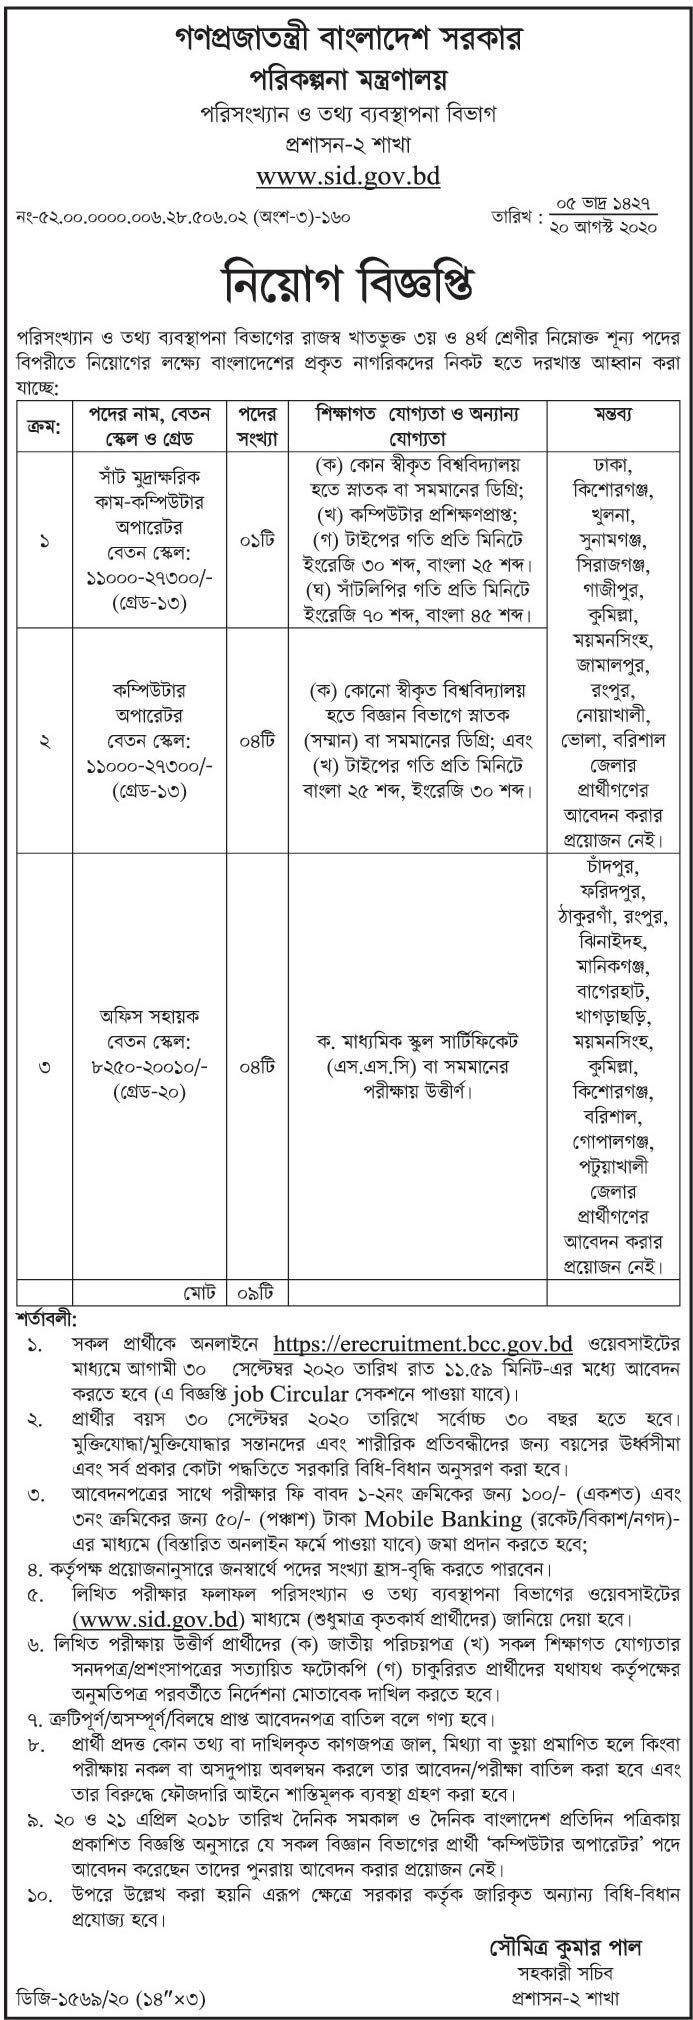 Ministry-Of-Planning-Job-Circular-2020-newsletter69.com